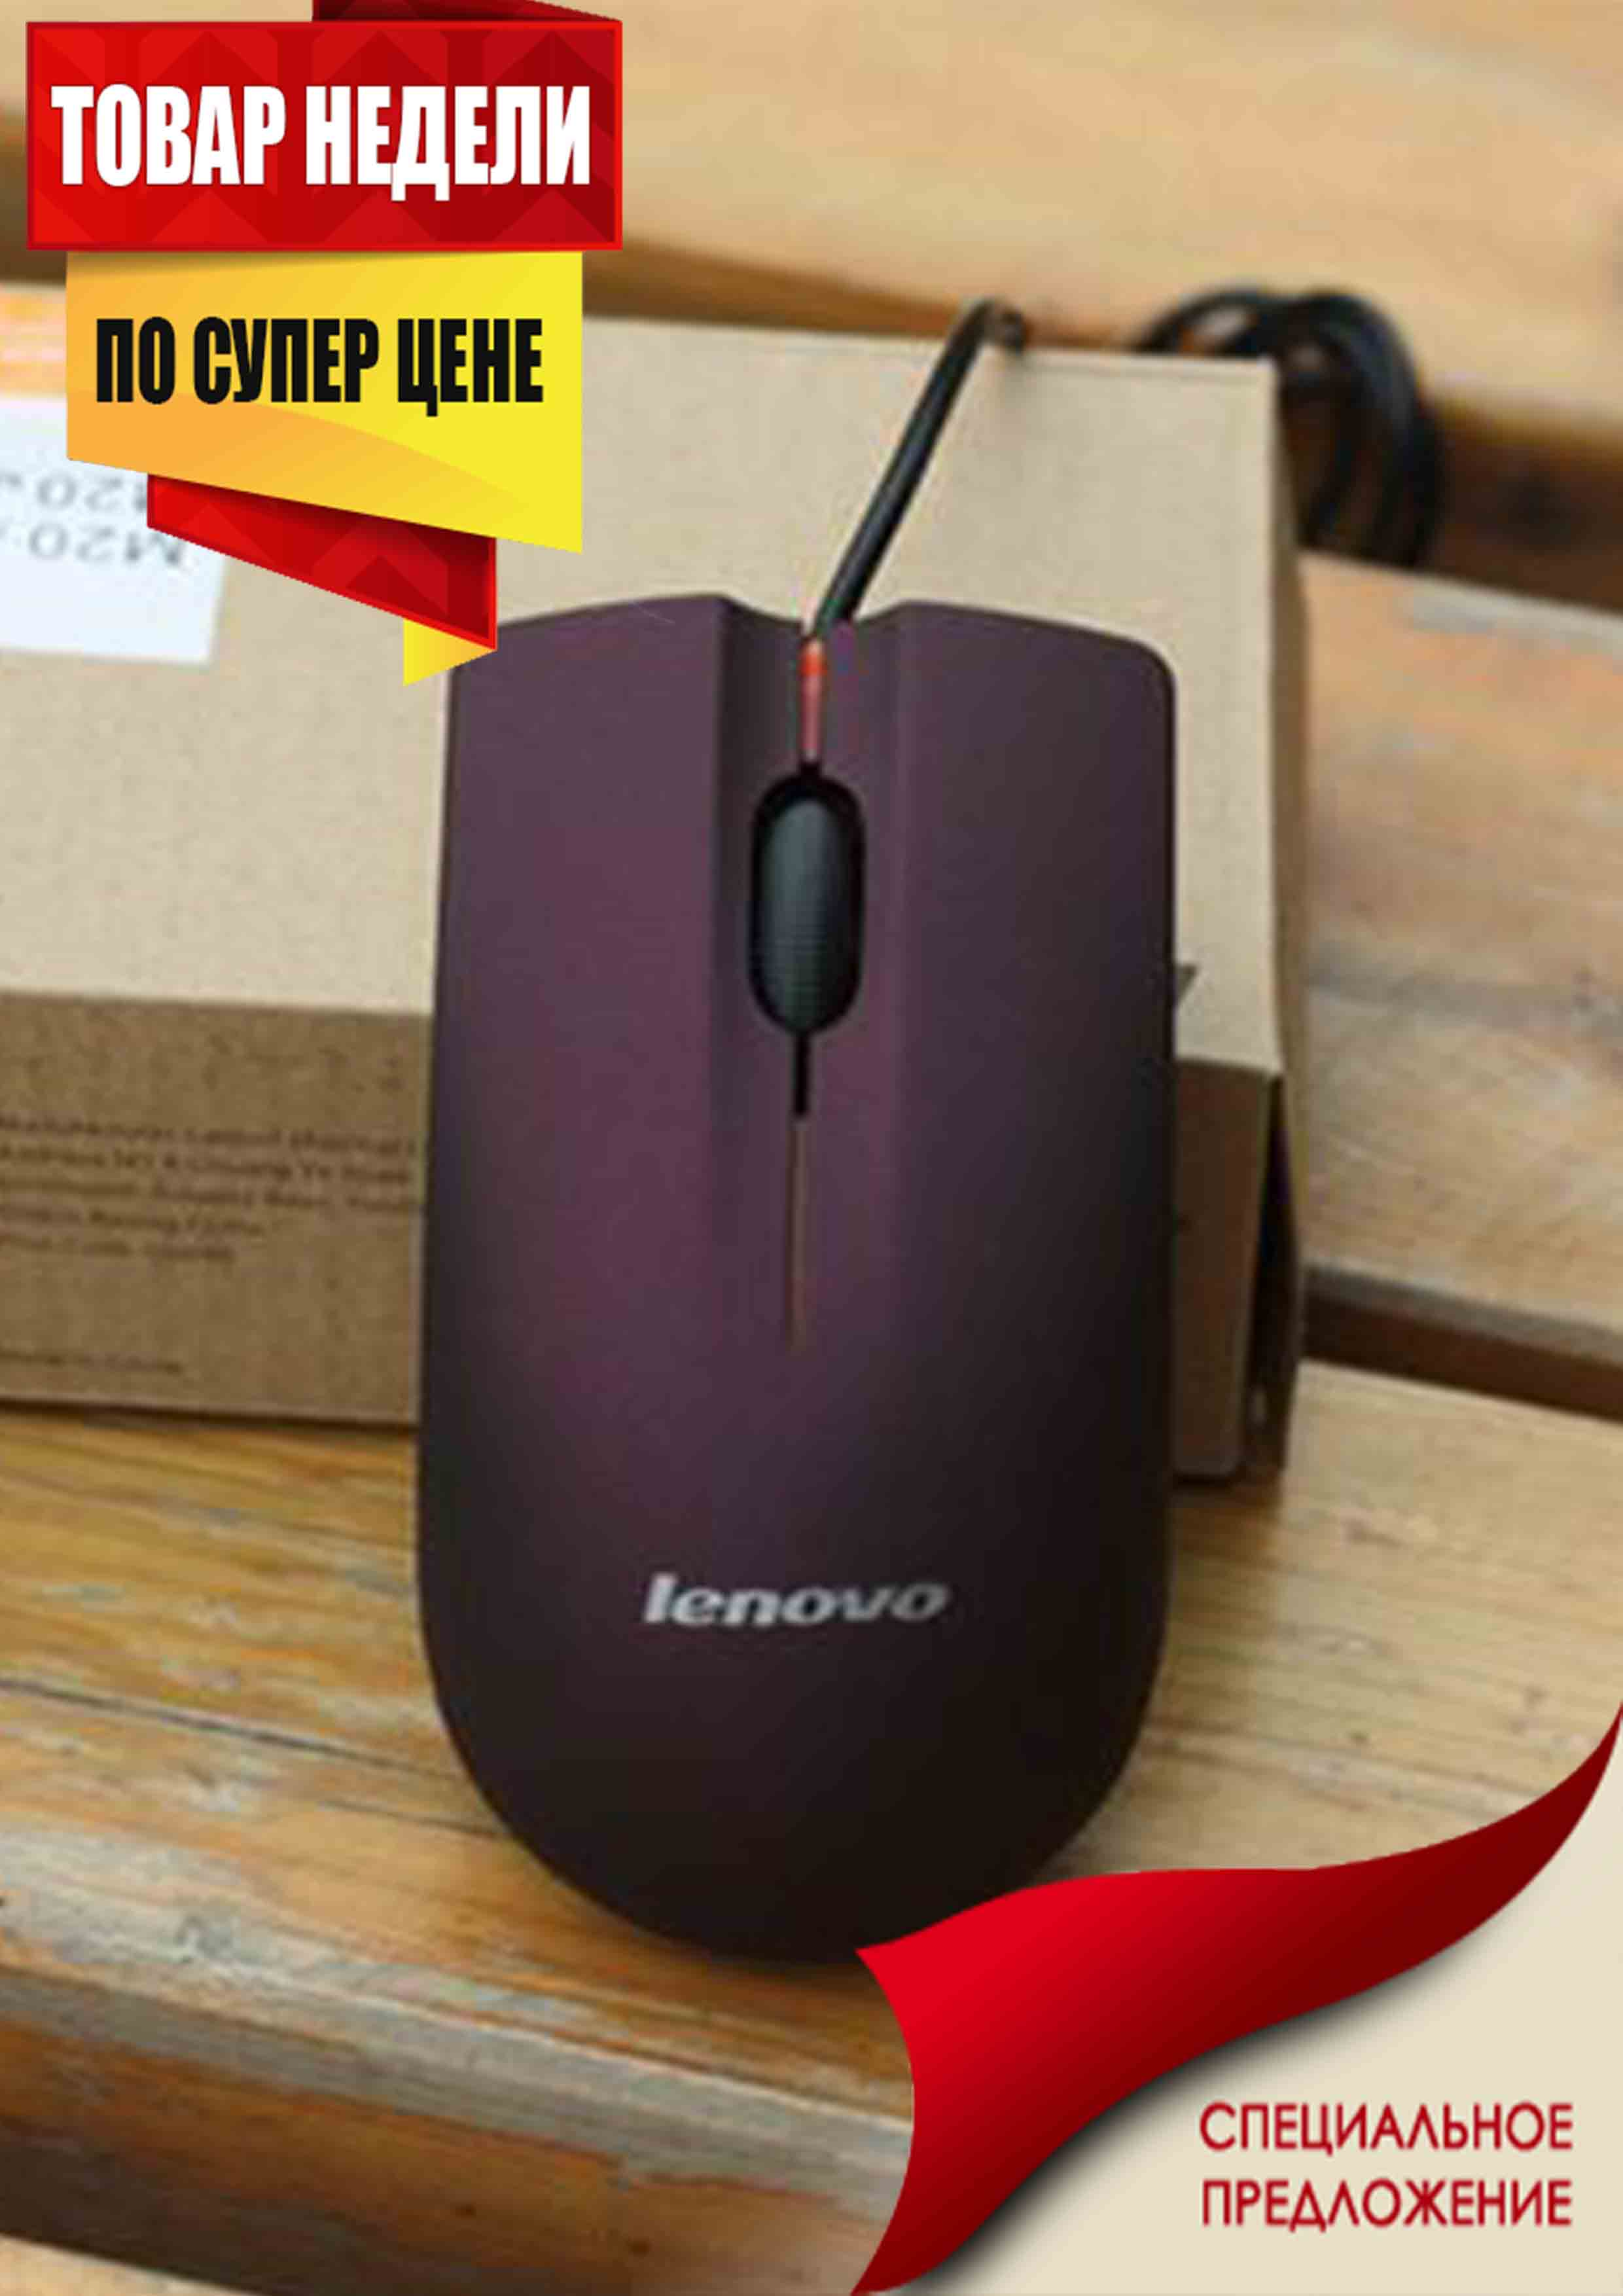 Mышка Lenovo M20